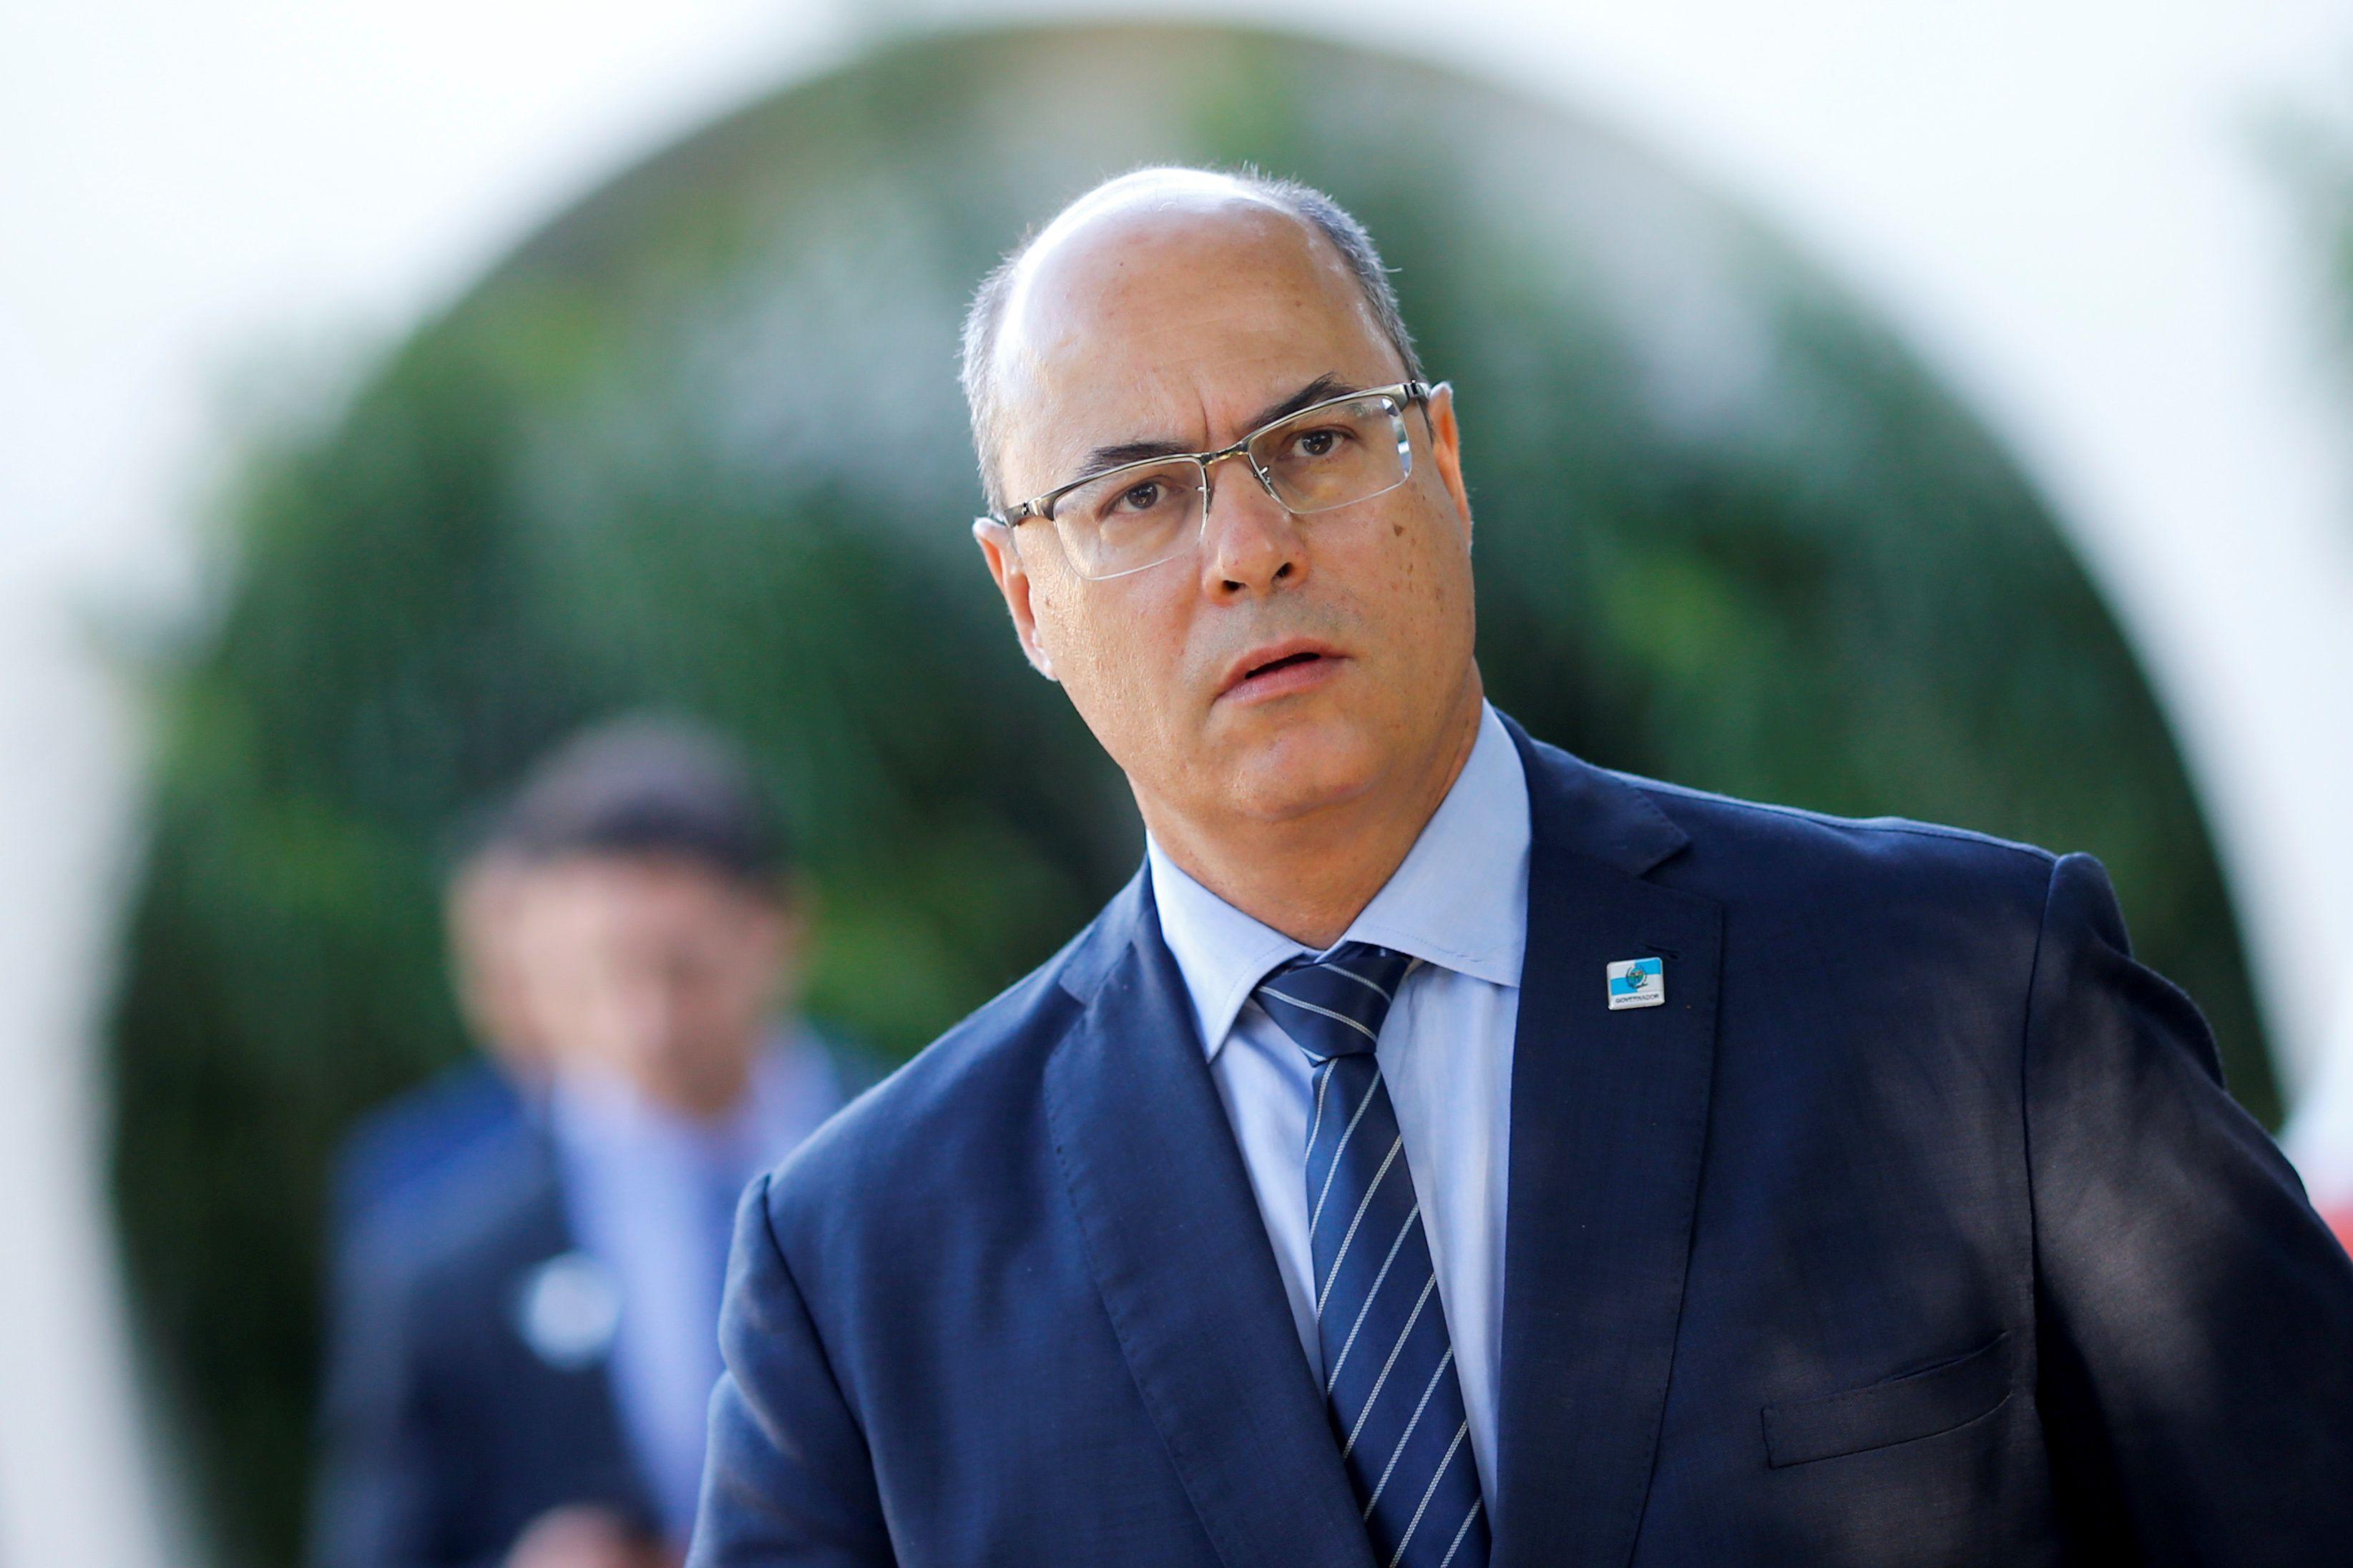 Governador do Rio de Janeiro, Wilson Witzel, volta a criticar ...